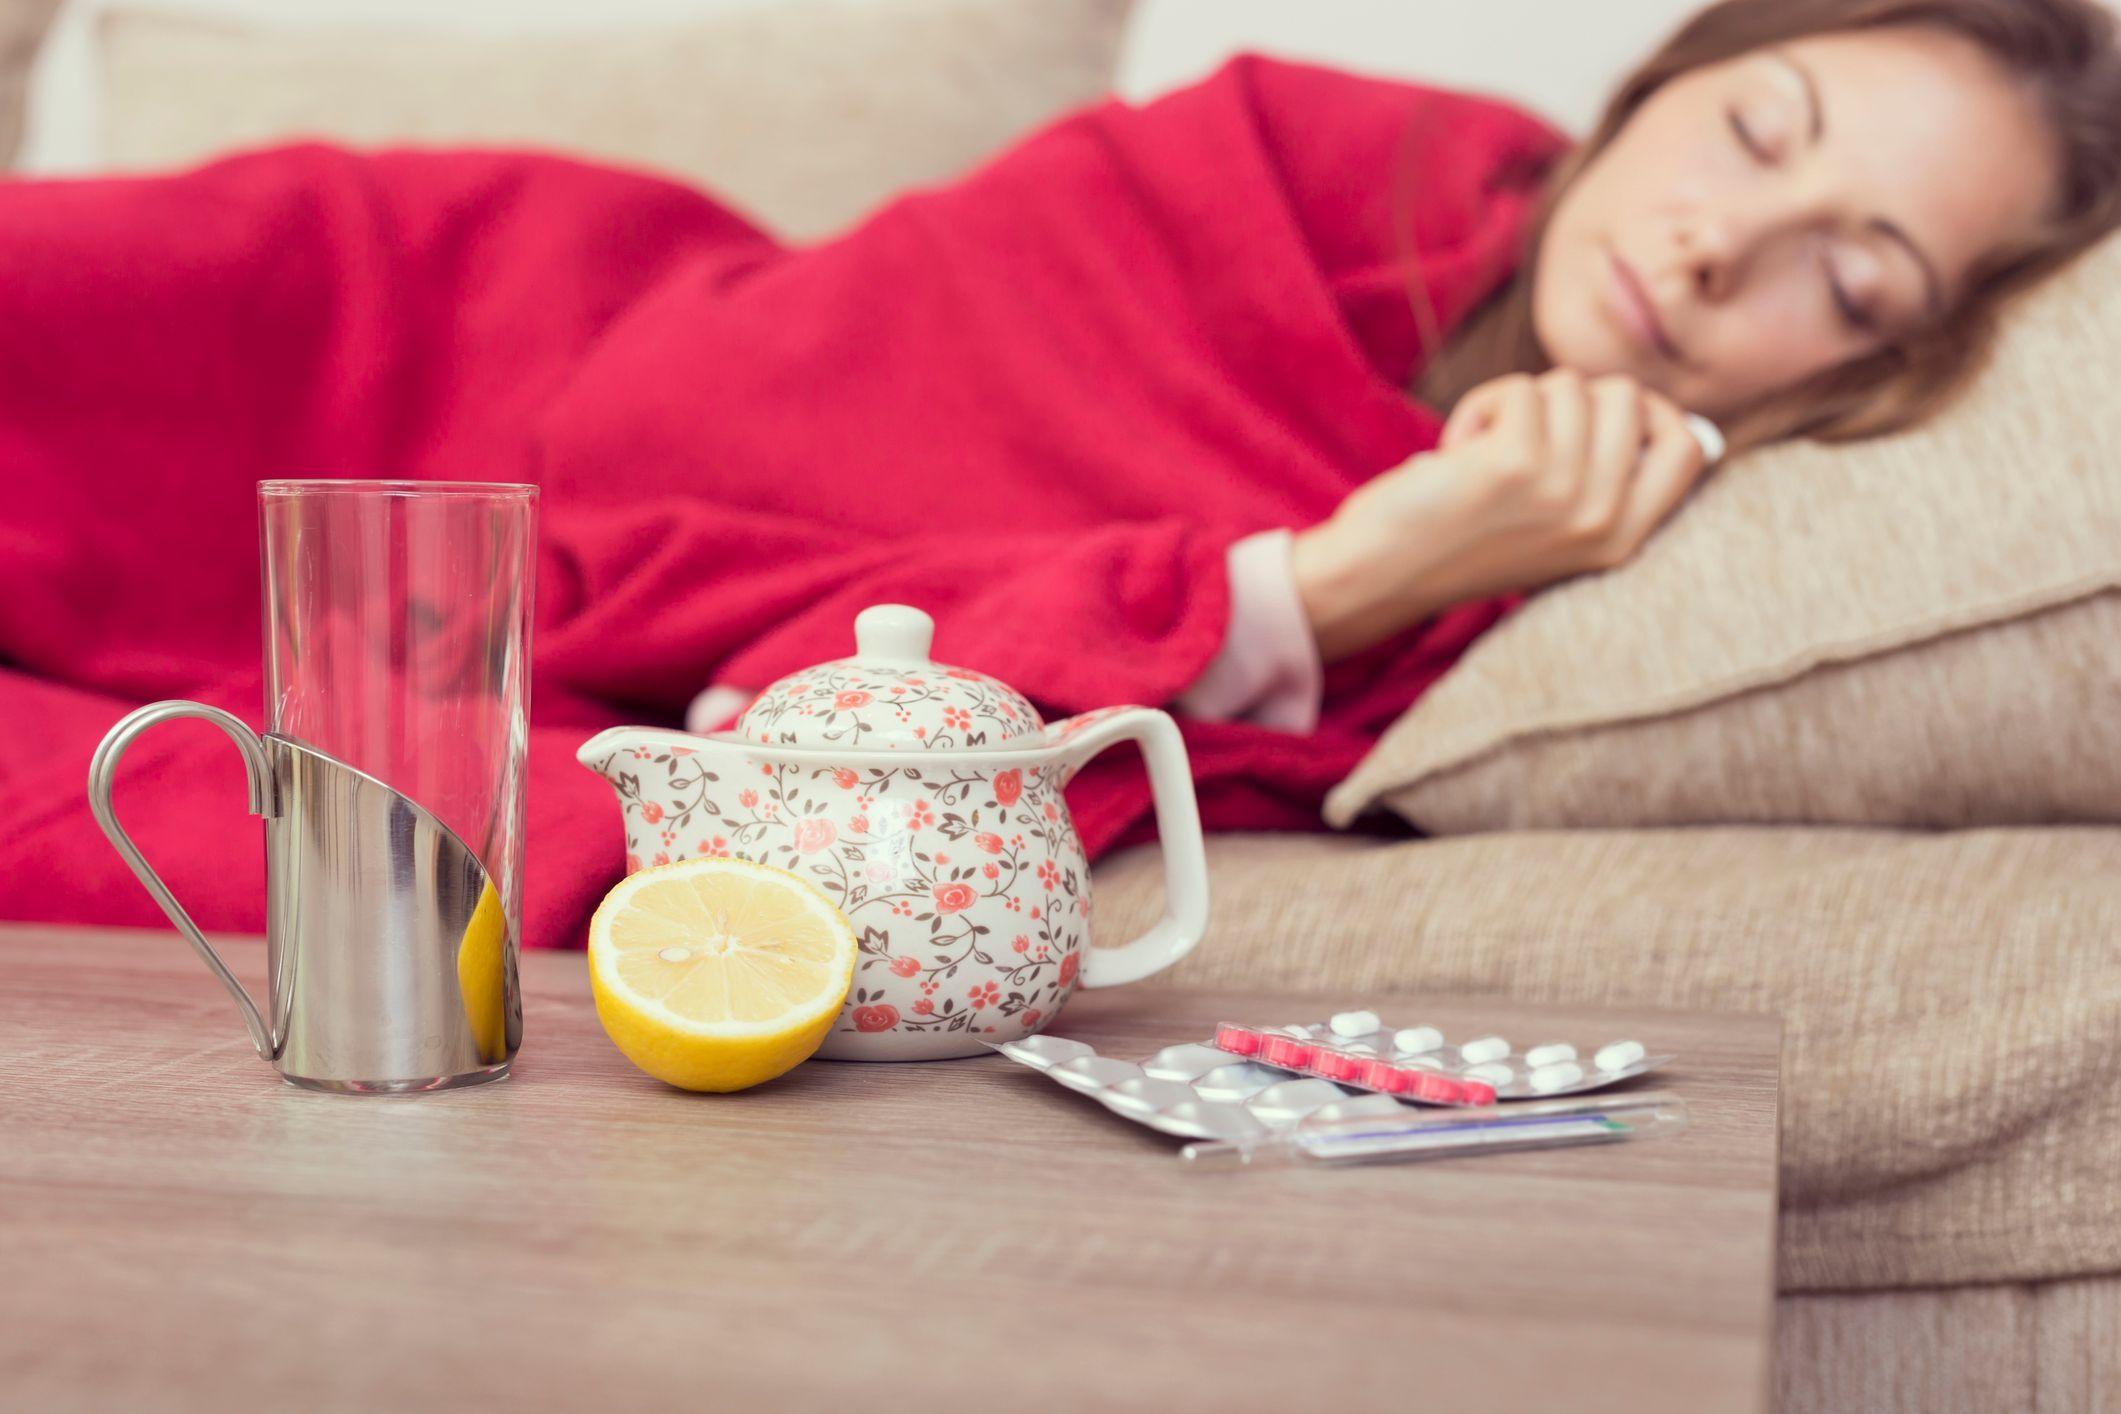 Antibiotiques et virus de l'hiver, ne faites pas n'importe quoi ...